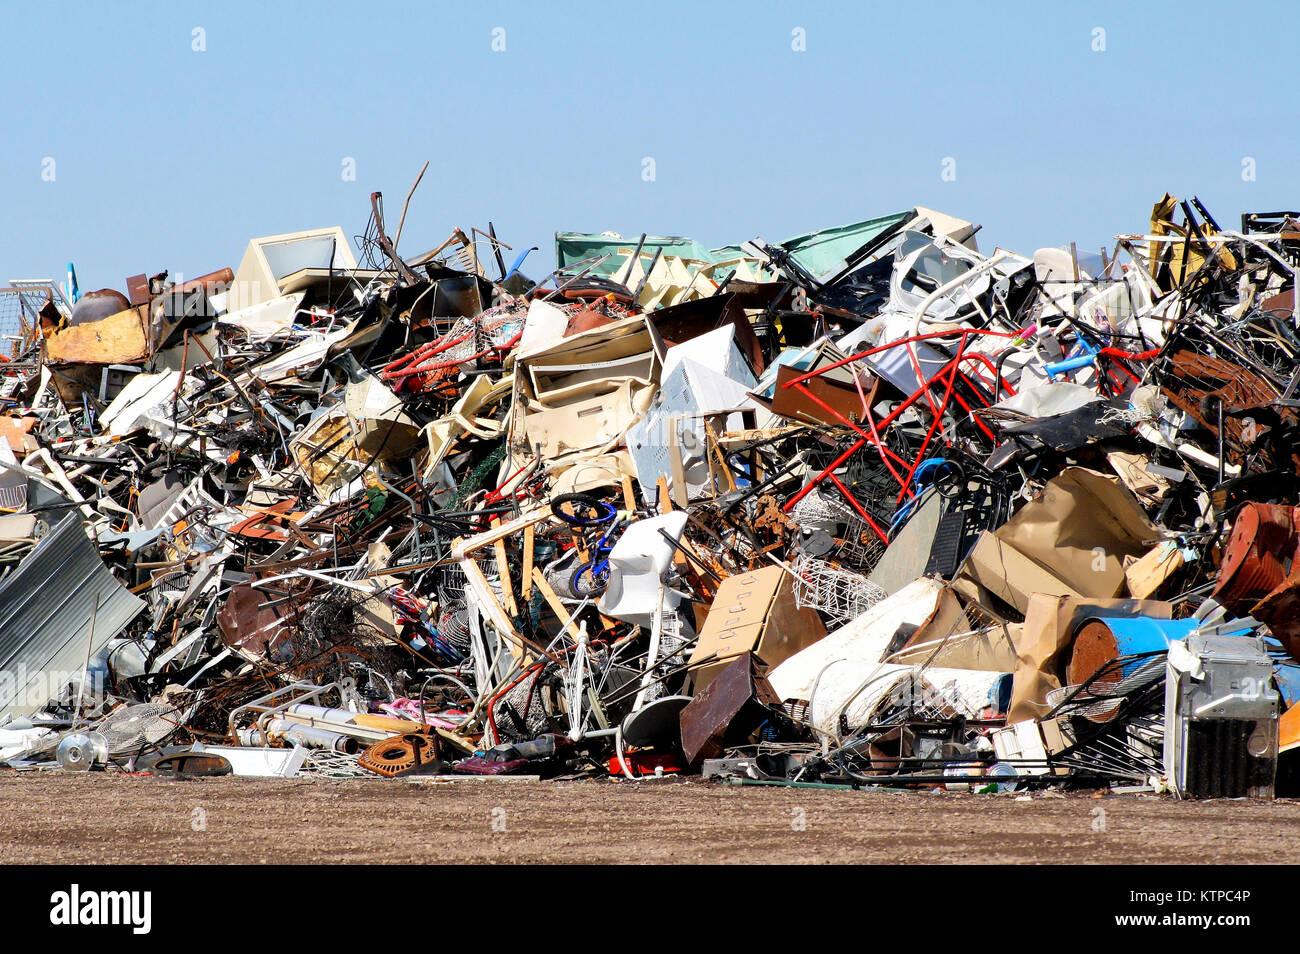 Garbage piled high at an outdoor landfill - scrap yard - Stock Image